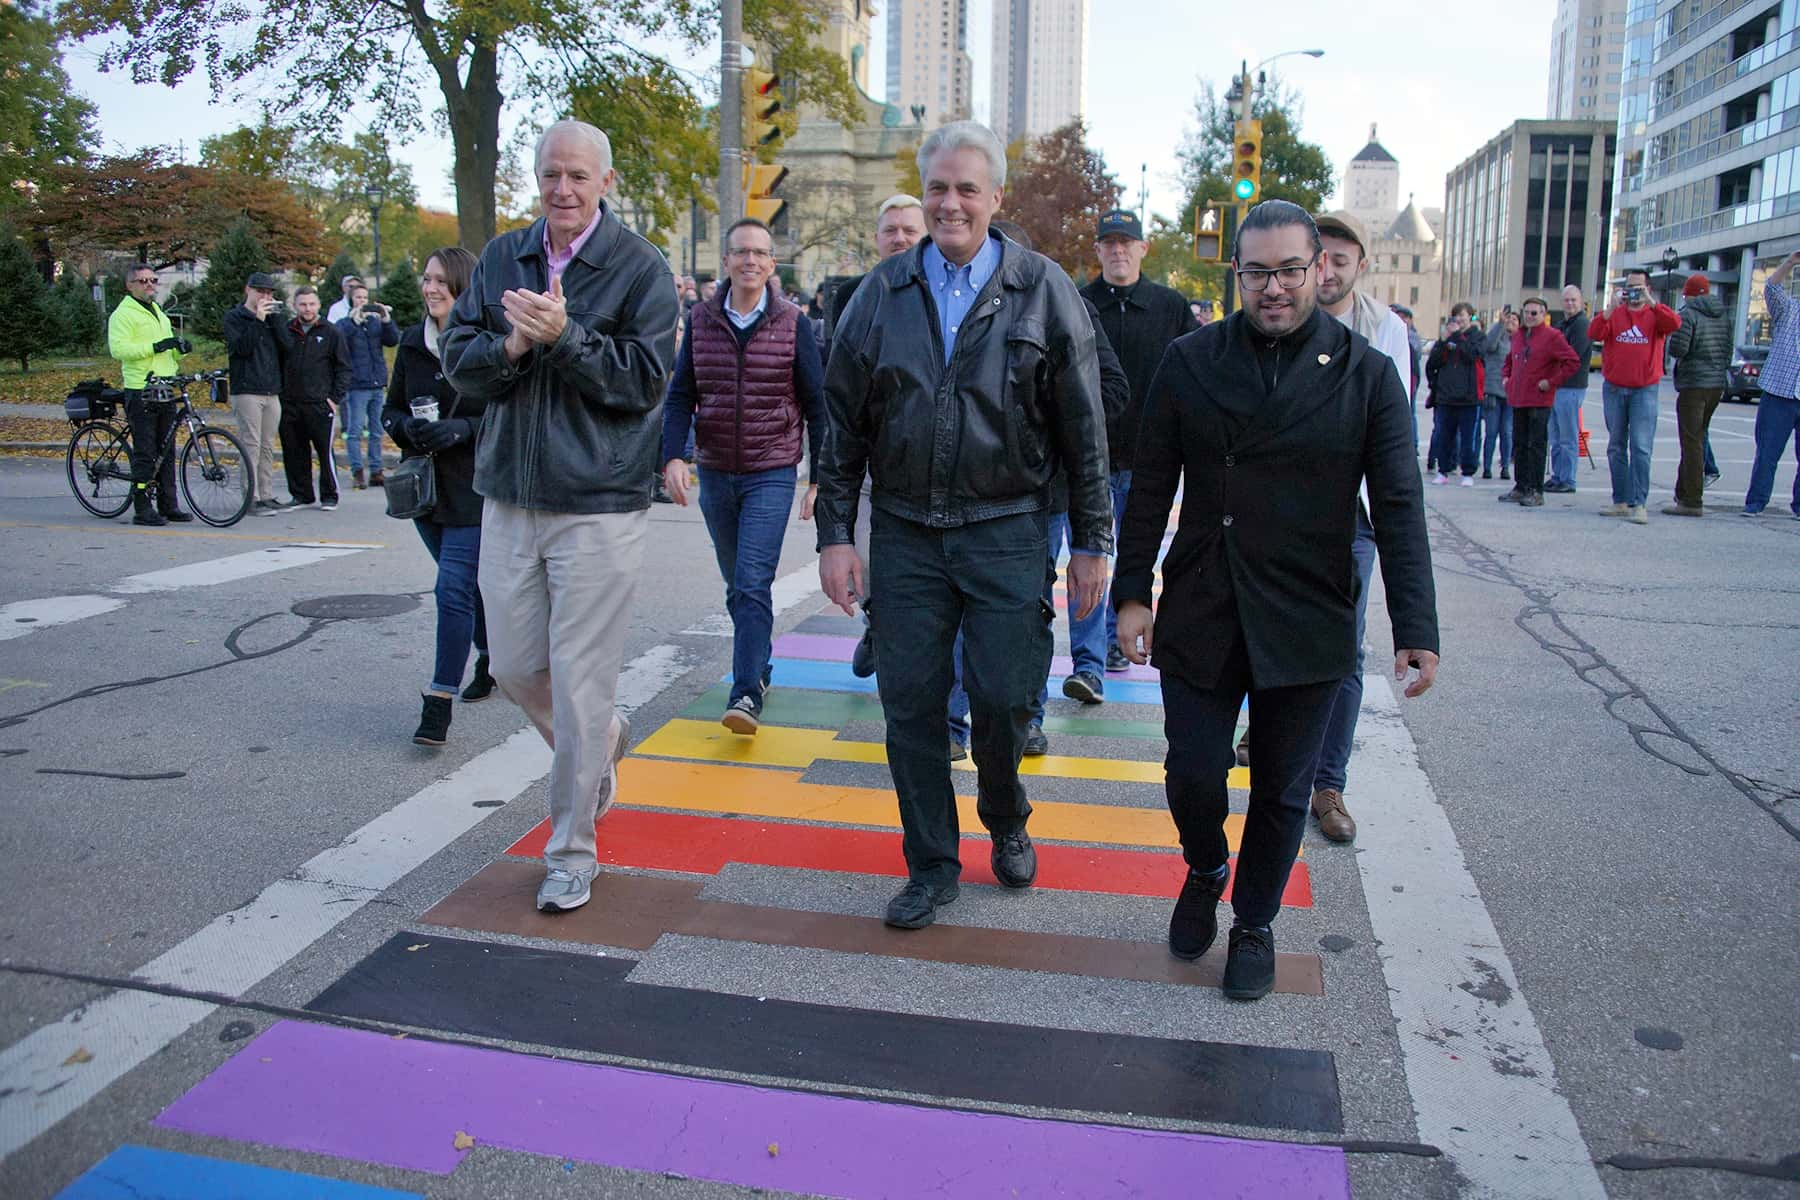 05_110318_rainbowcrosswalk_655